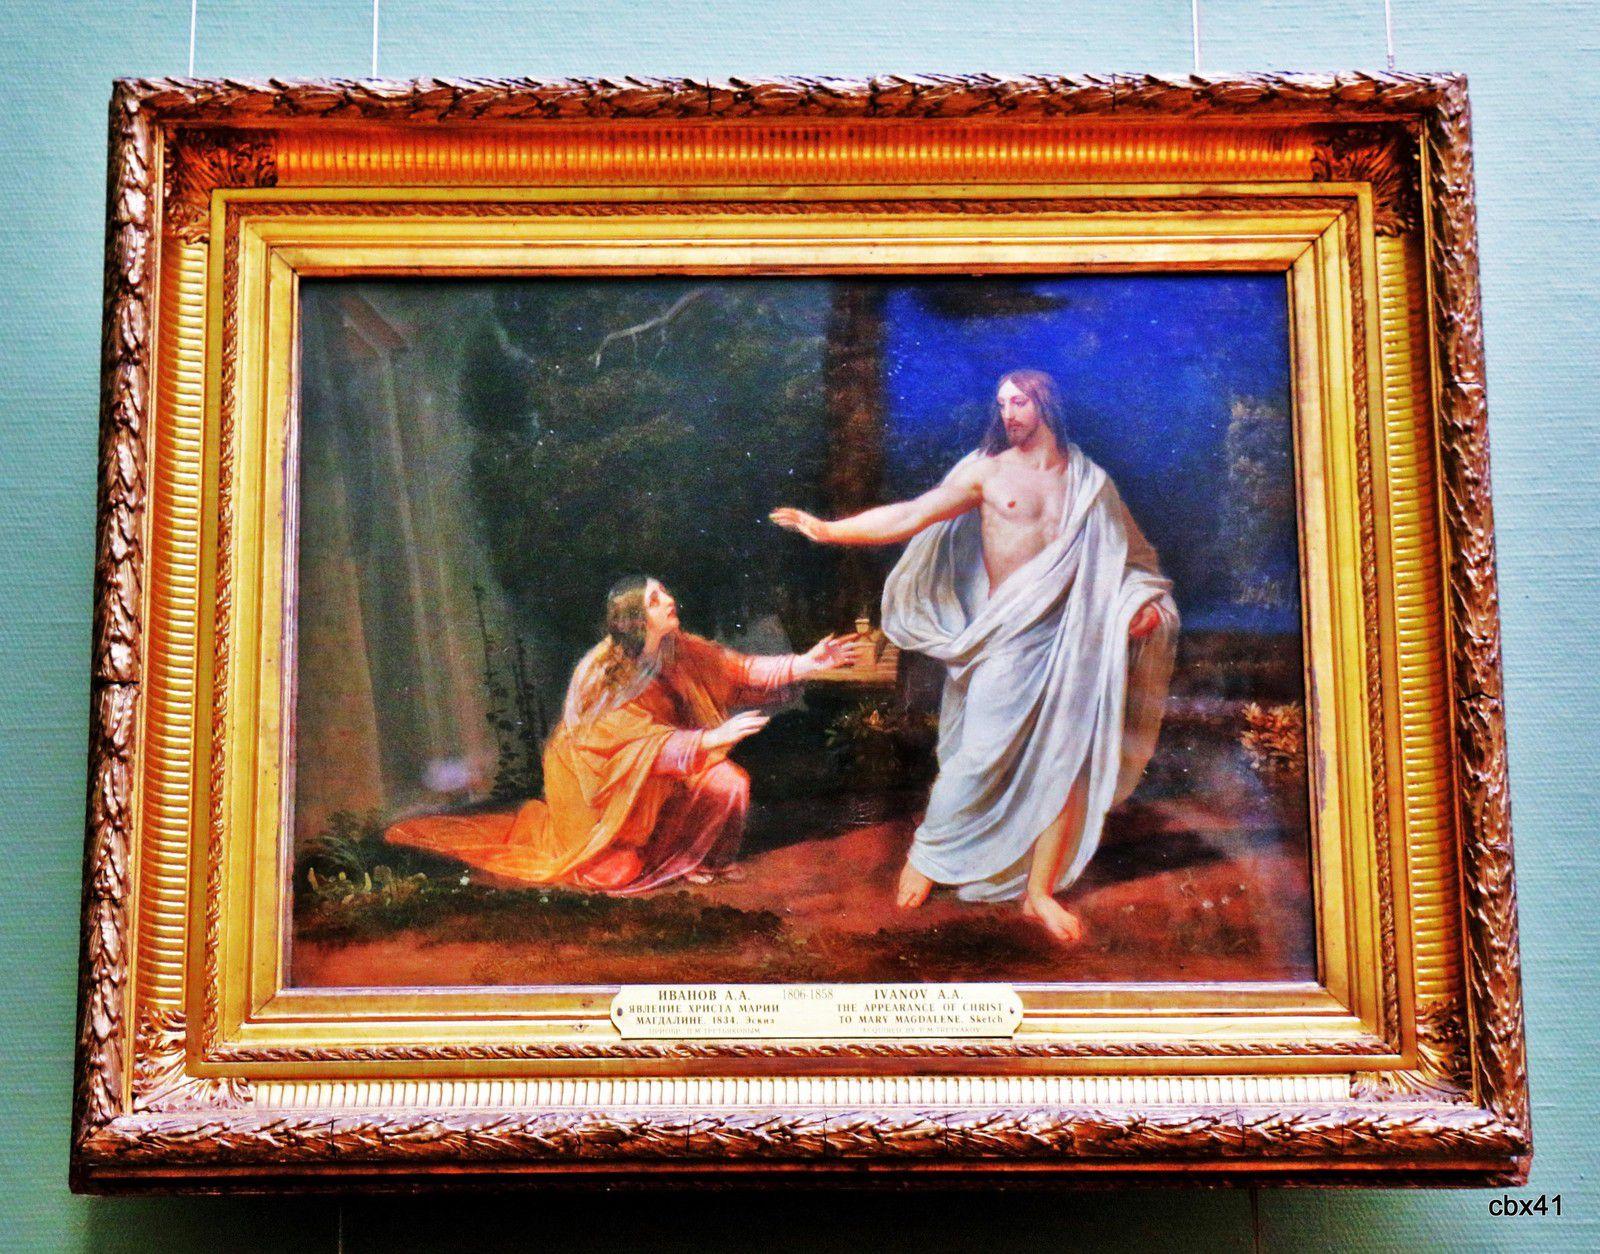 A. A. Ivanov, Apparition du Christ à Marie-Madeleine